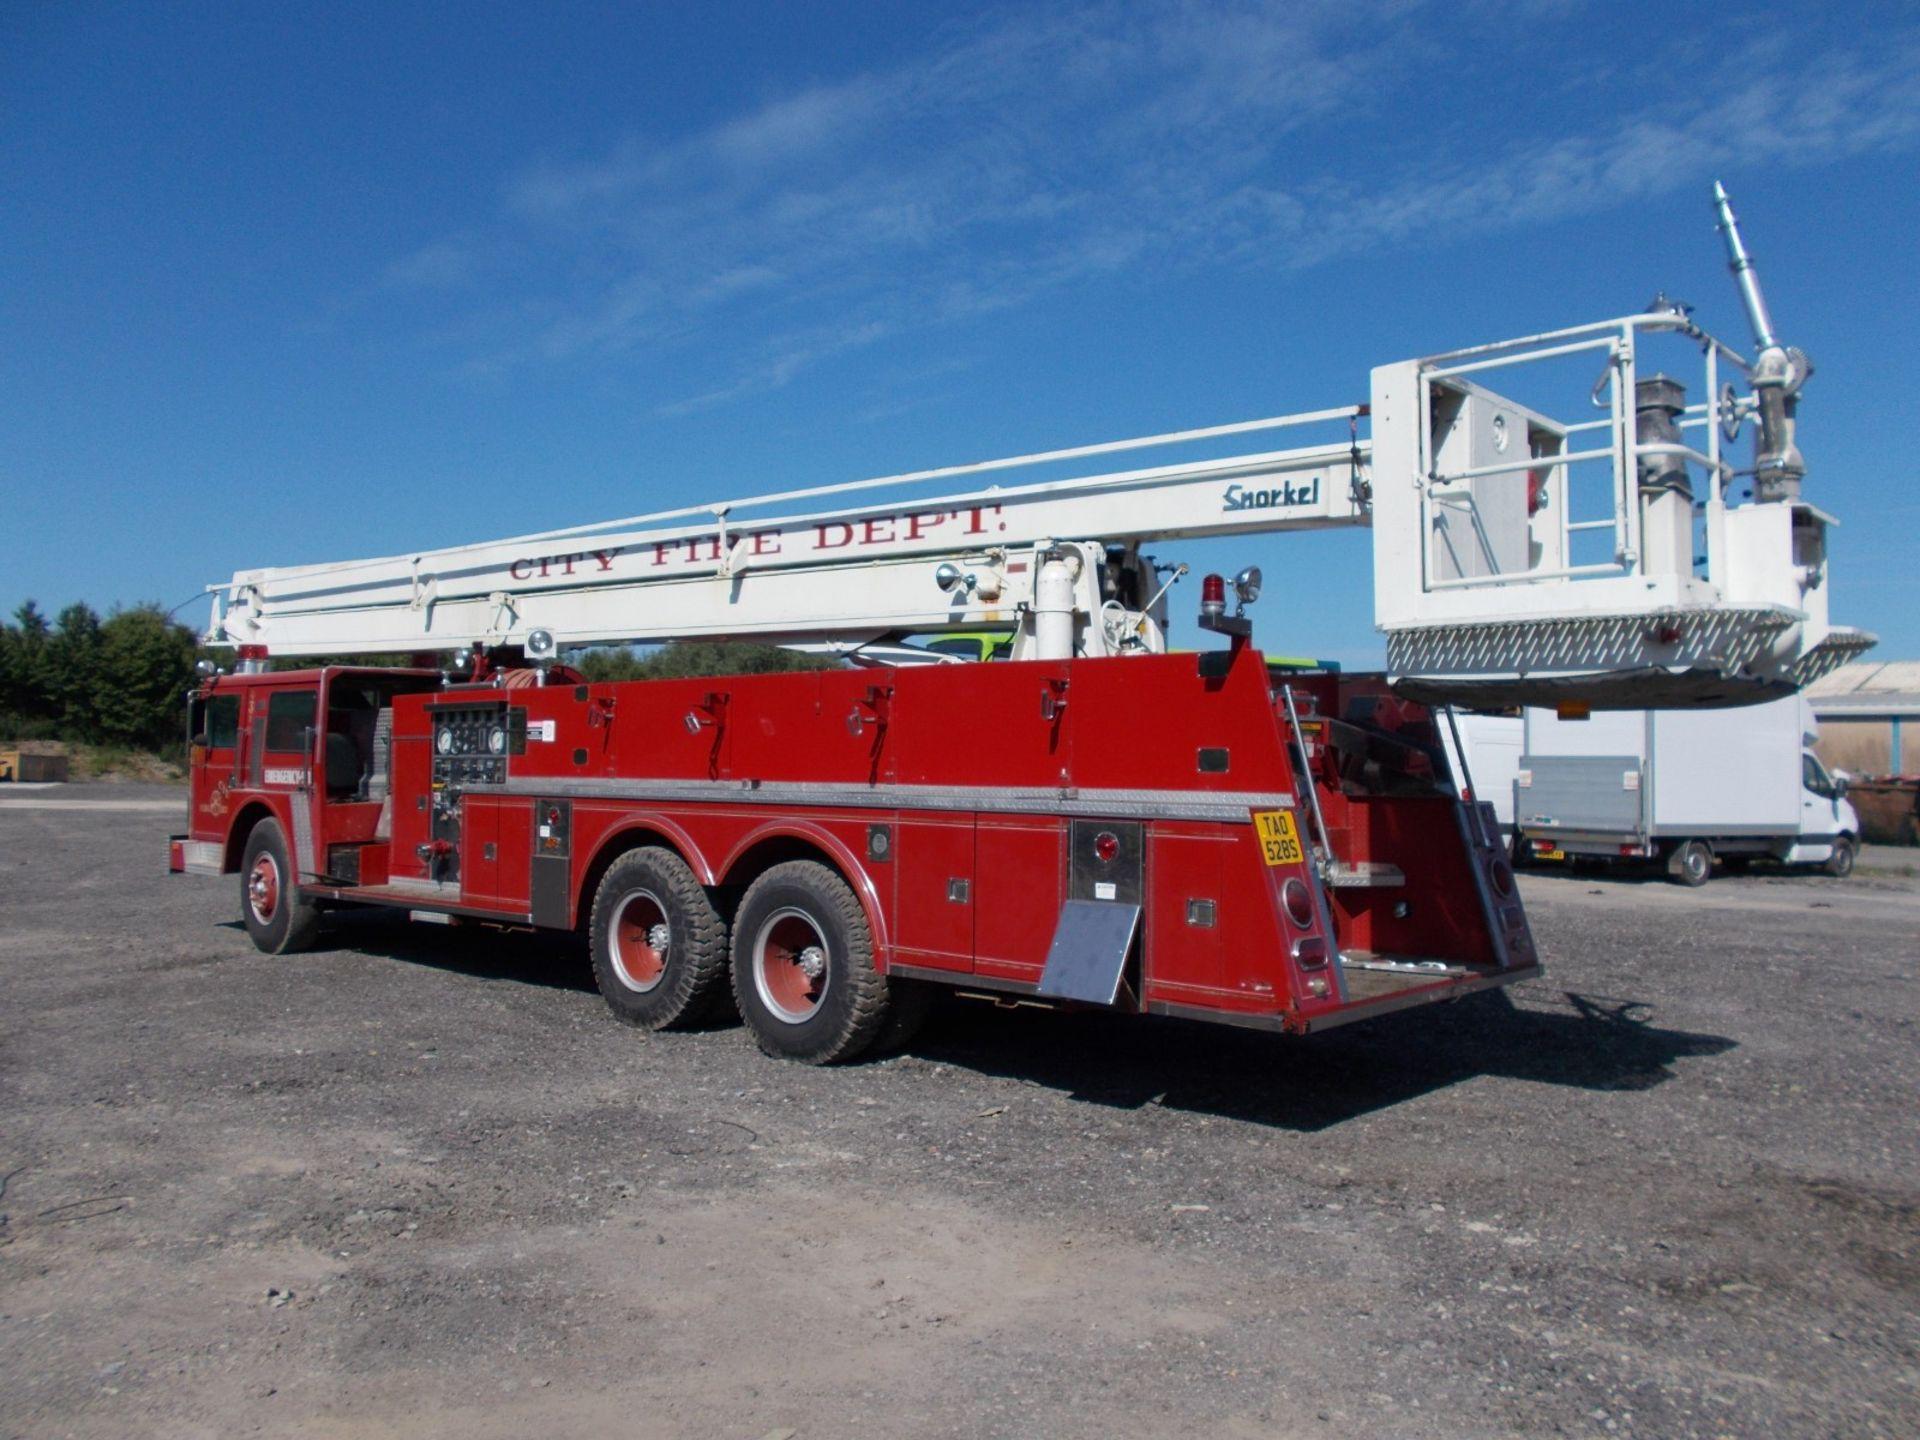 1978 HENDRICKSON 871-LPS SNORKEL FIRE TRUCK, U.S. IMPORT, 7.0 LITRE DETROIT DIESEL ENGINE *PLUS VAT* - Image 3 of 22